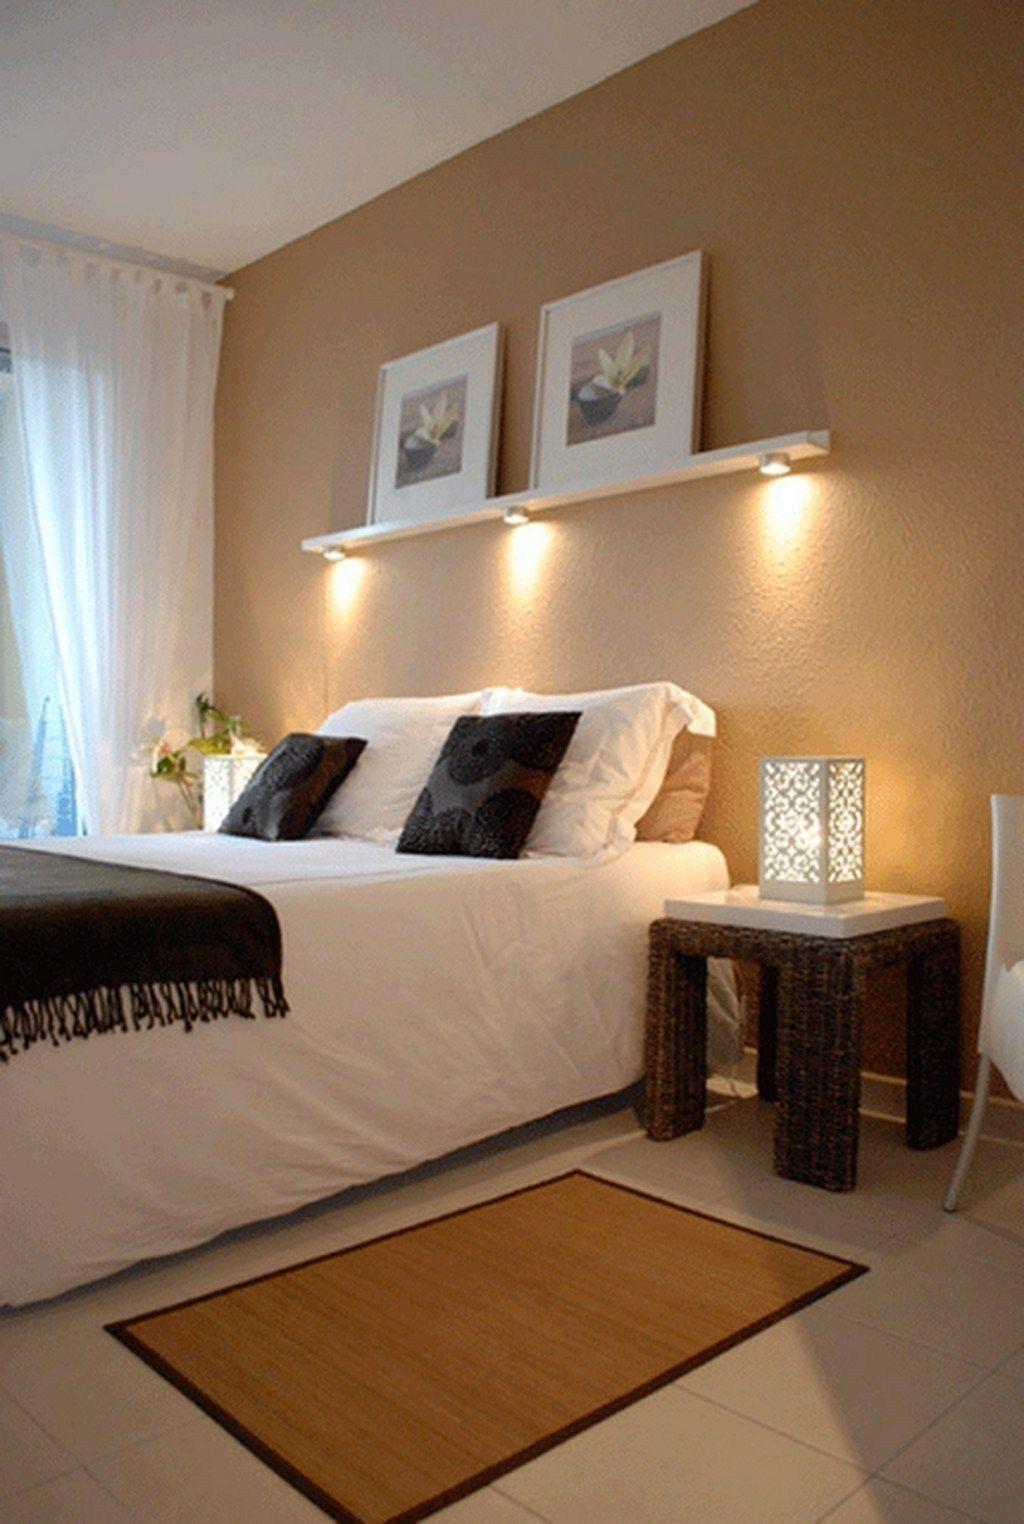 39 Unordinary Diy Headboard Ideas For Bedroom Look Fabulous Bedroom Wall Decor Above Bed Bedroom Interior Modern Bedroom